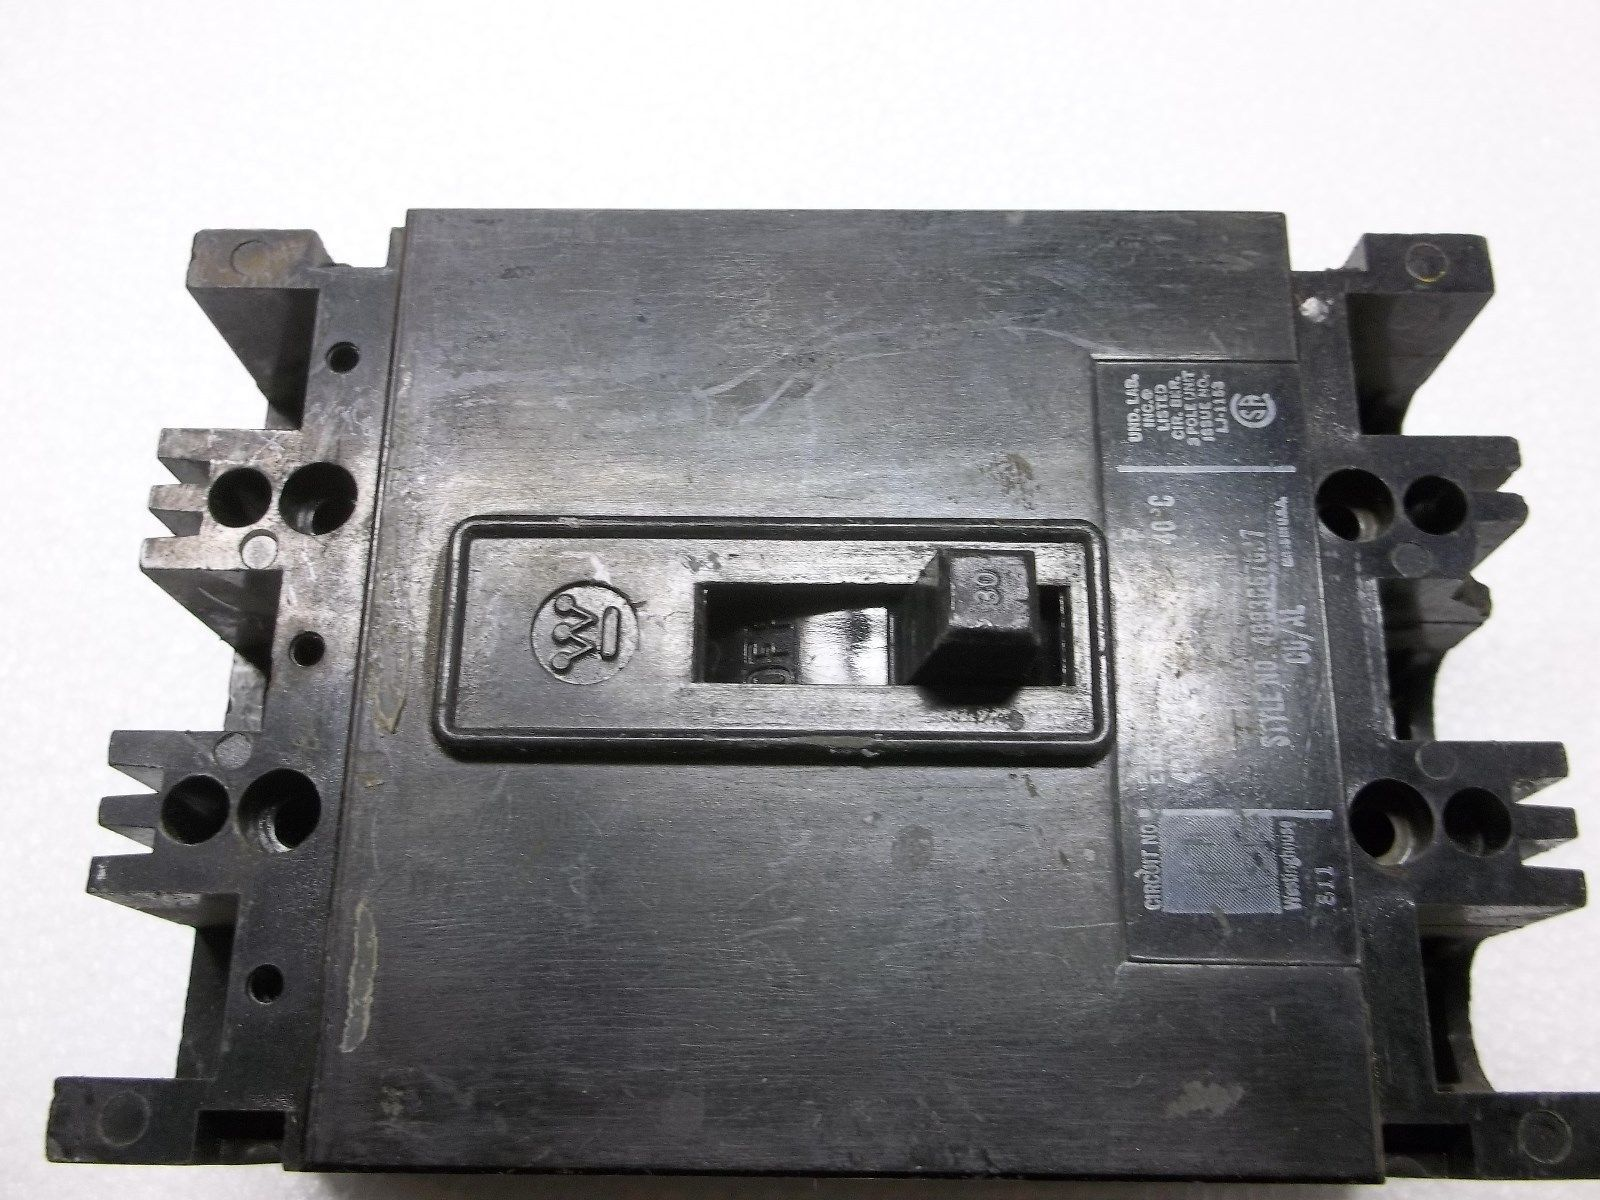 Westinghouse CUTLER HAMMER EHB3030L 30 AMP CIRCUIT BREAKER